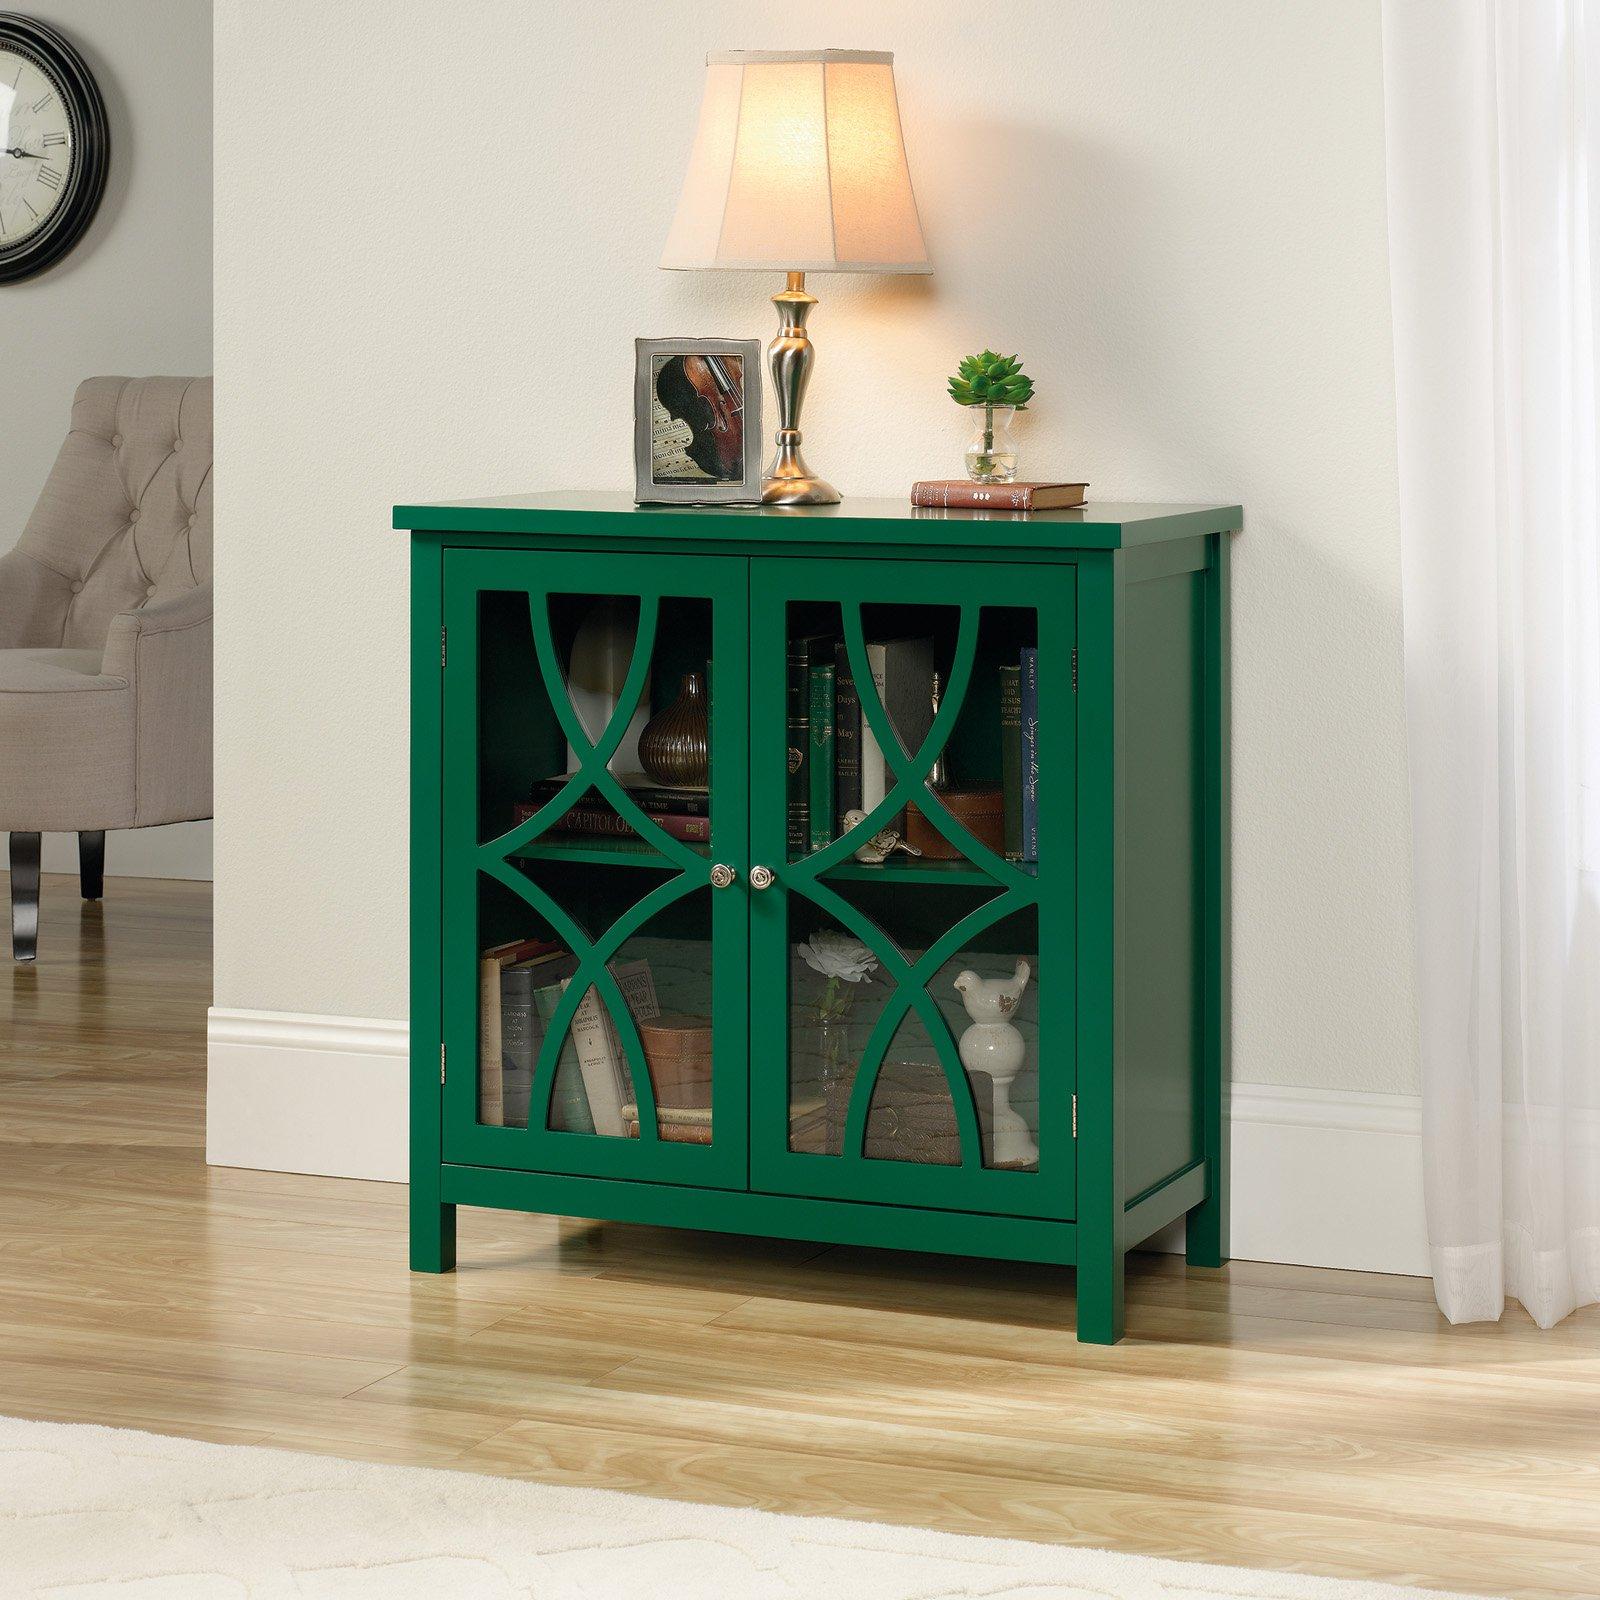 Sauder Palladia Accent Storage Cabinet, Emerald Green Finish